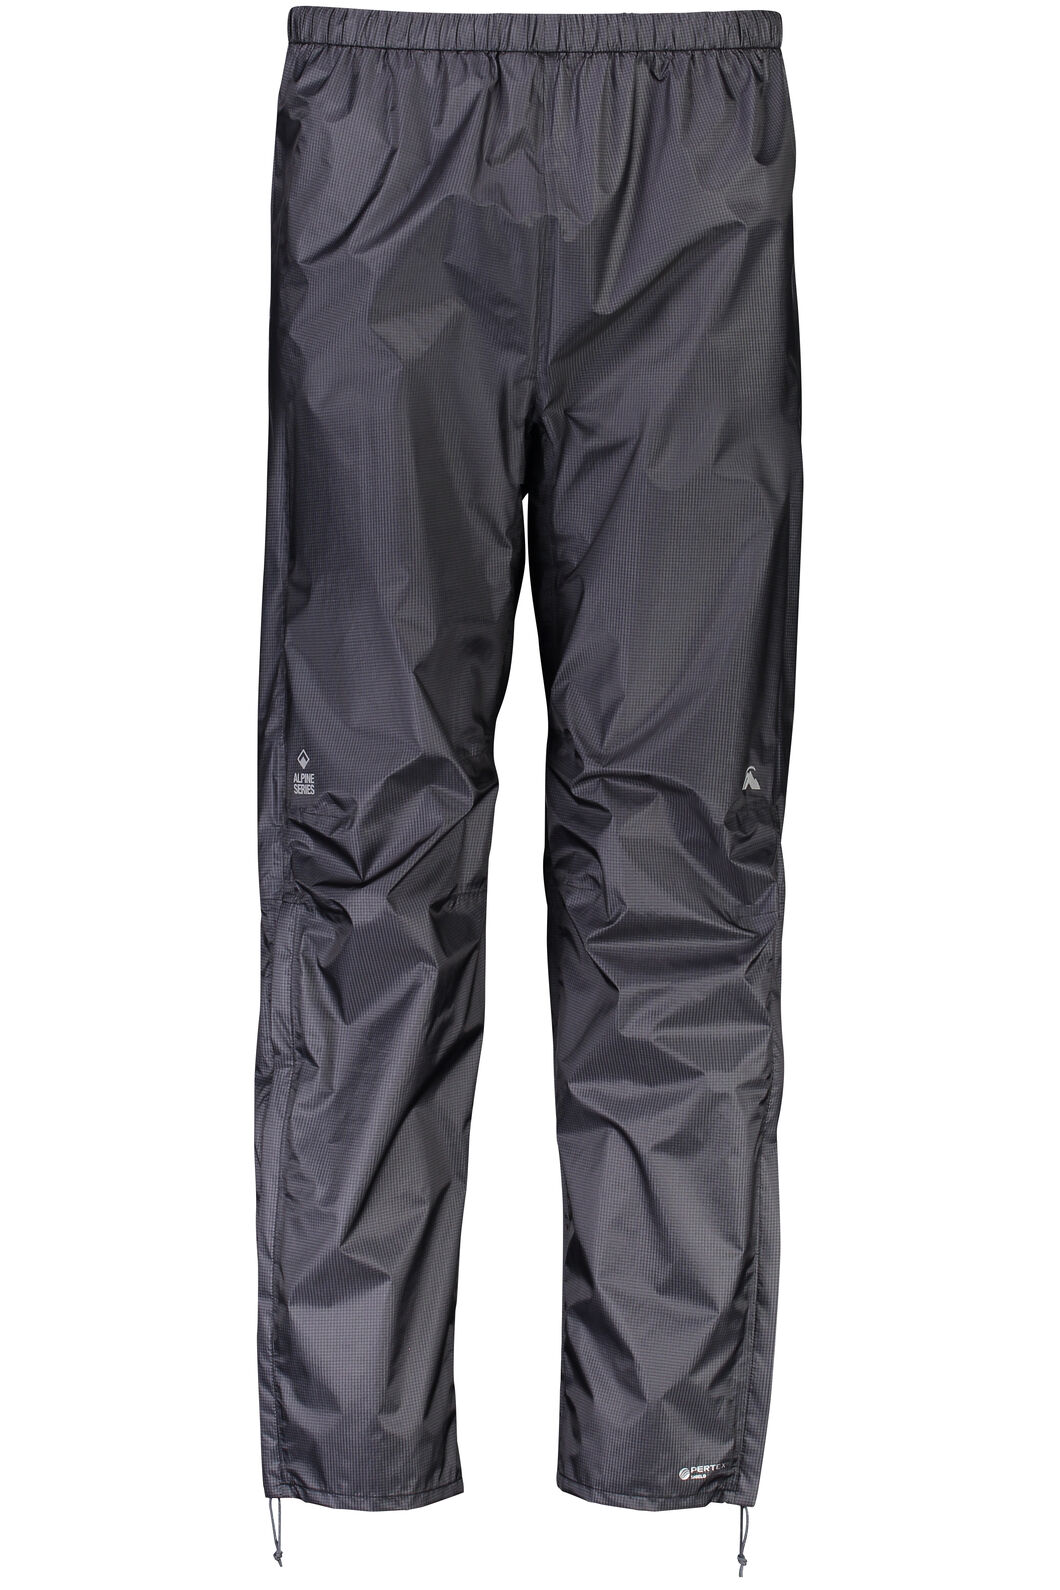 Macpac Hightail Pertex® Shield Rain Pants - Men's, Black, hi-res